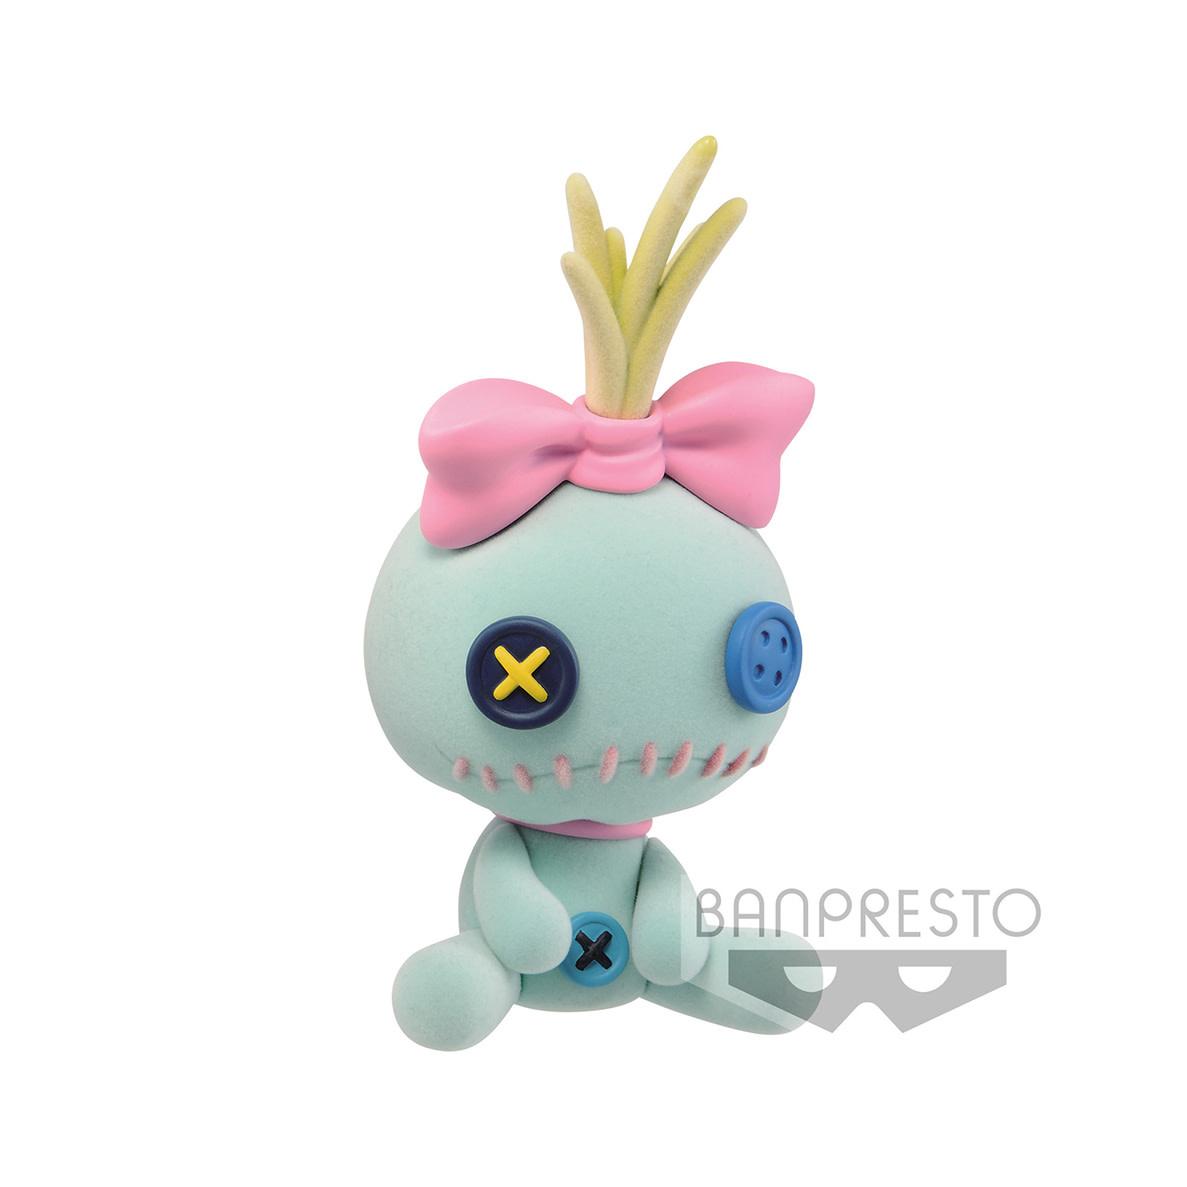 Banpresto Disney: Character Fluffy Puffy Stitch and Scrump - Scrump